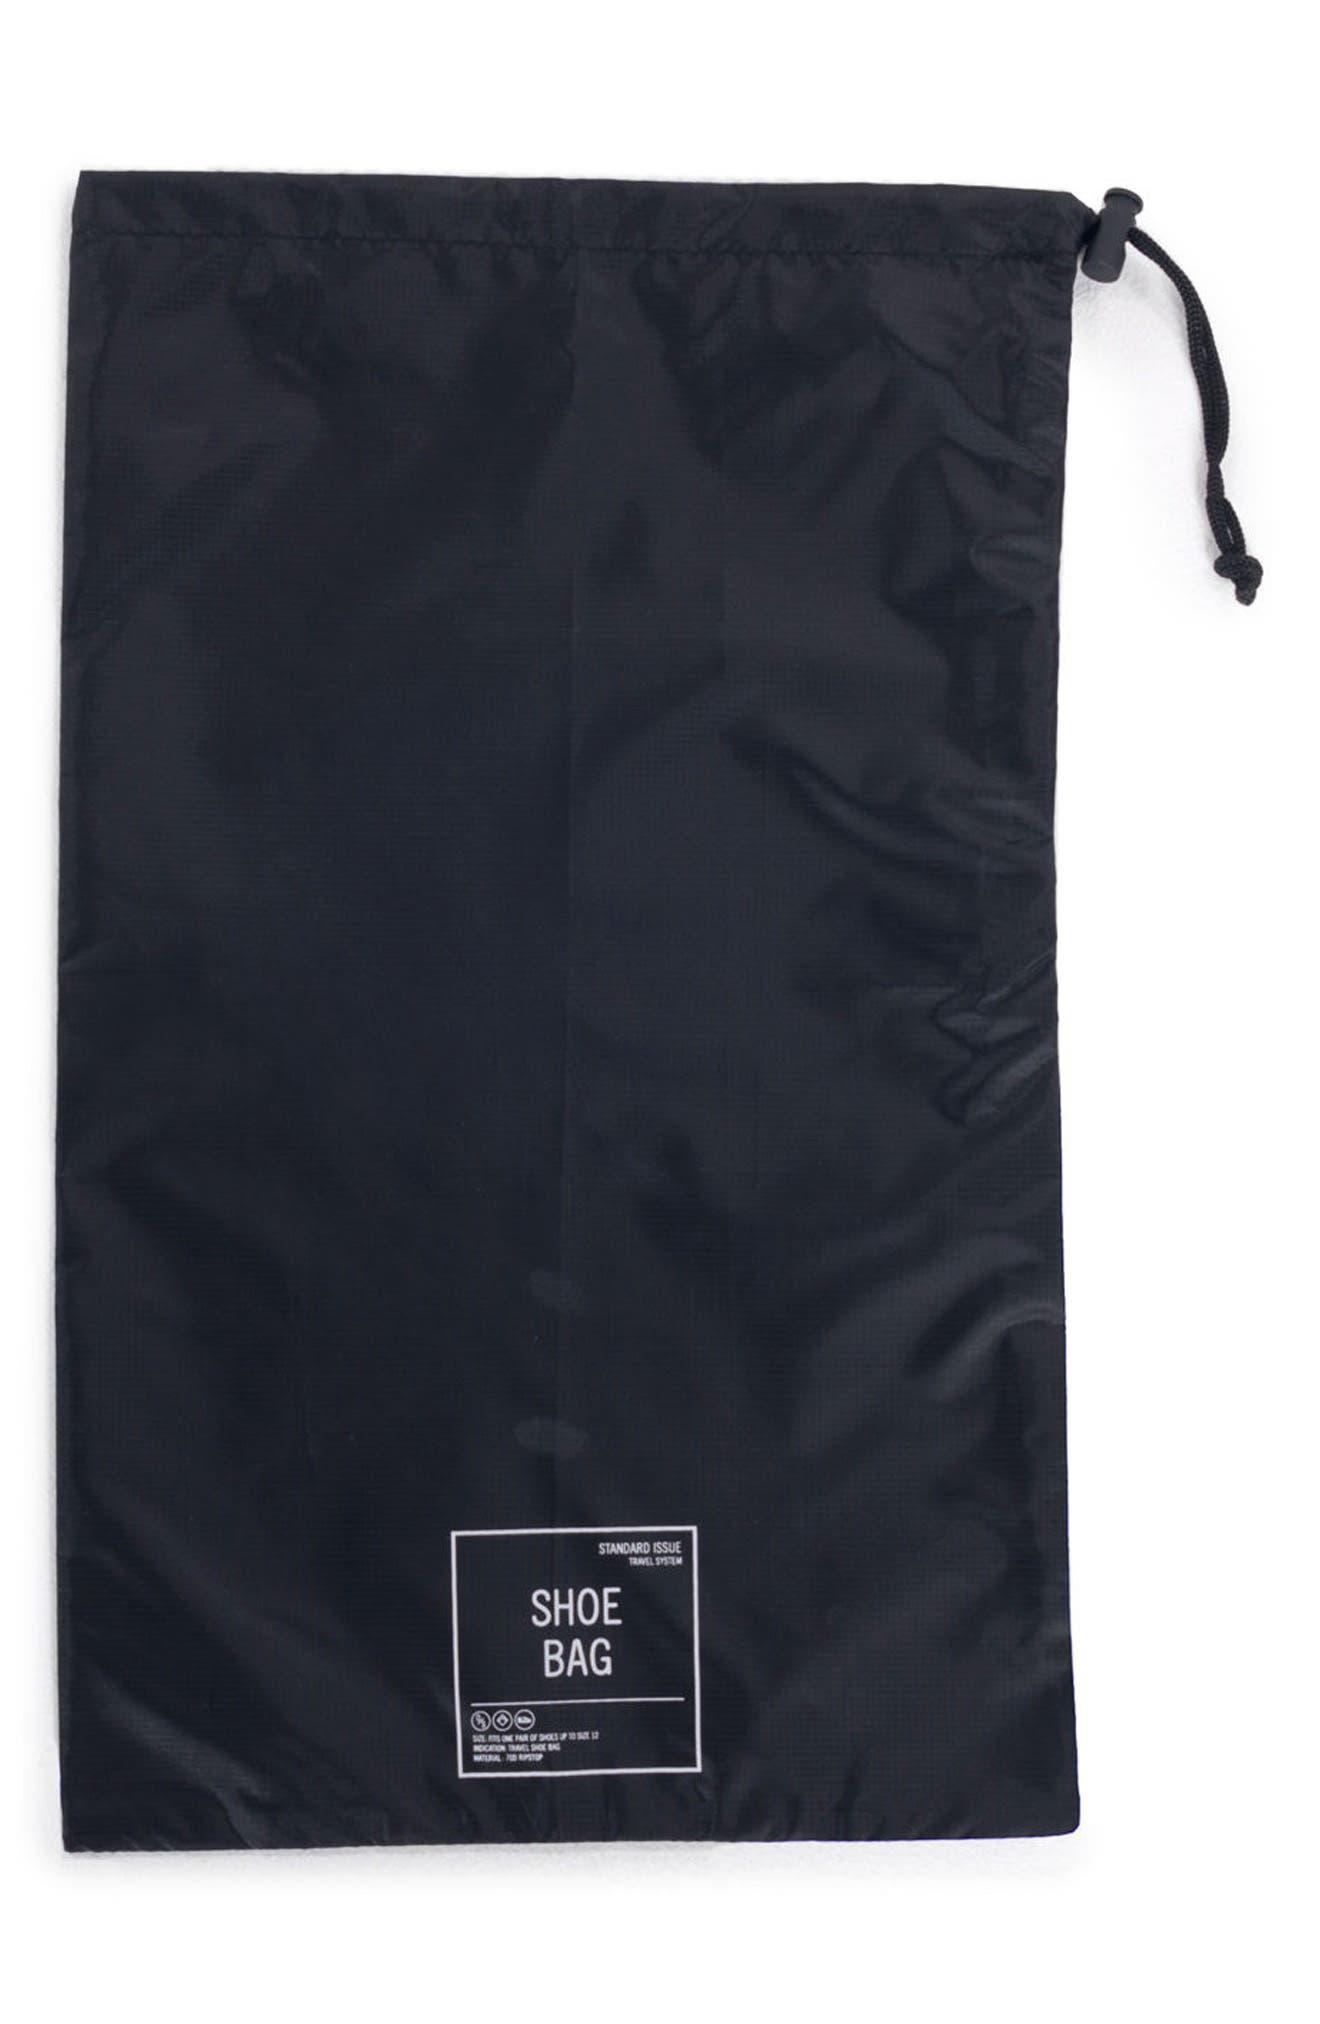 Shoe Bag Set,                             Alternate thumbnail 3, color,                             BLACK